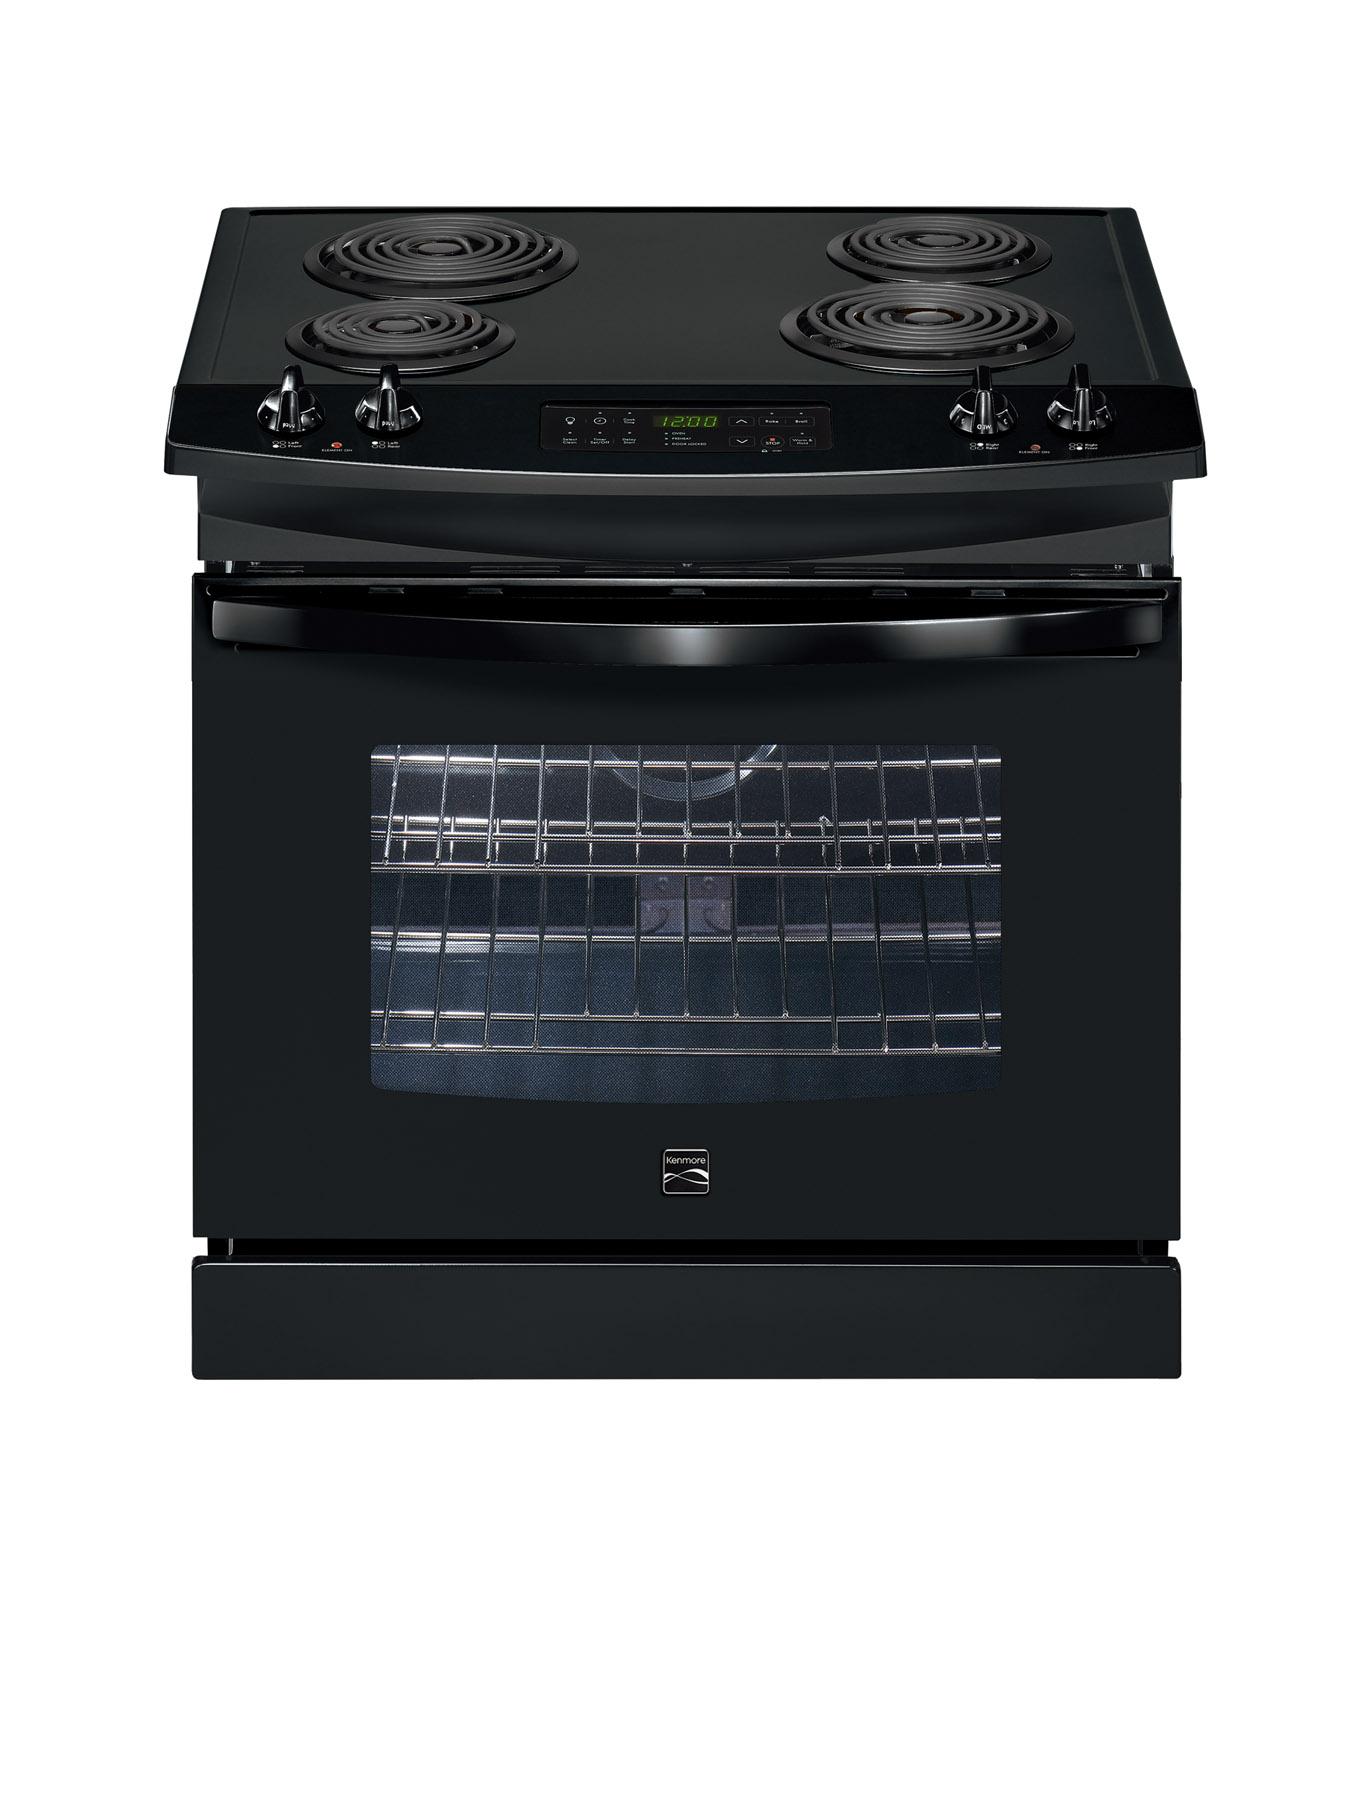 Kenmore Range  Stove  Oven Model 790 45589900 Parts